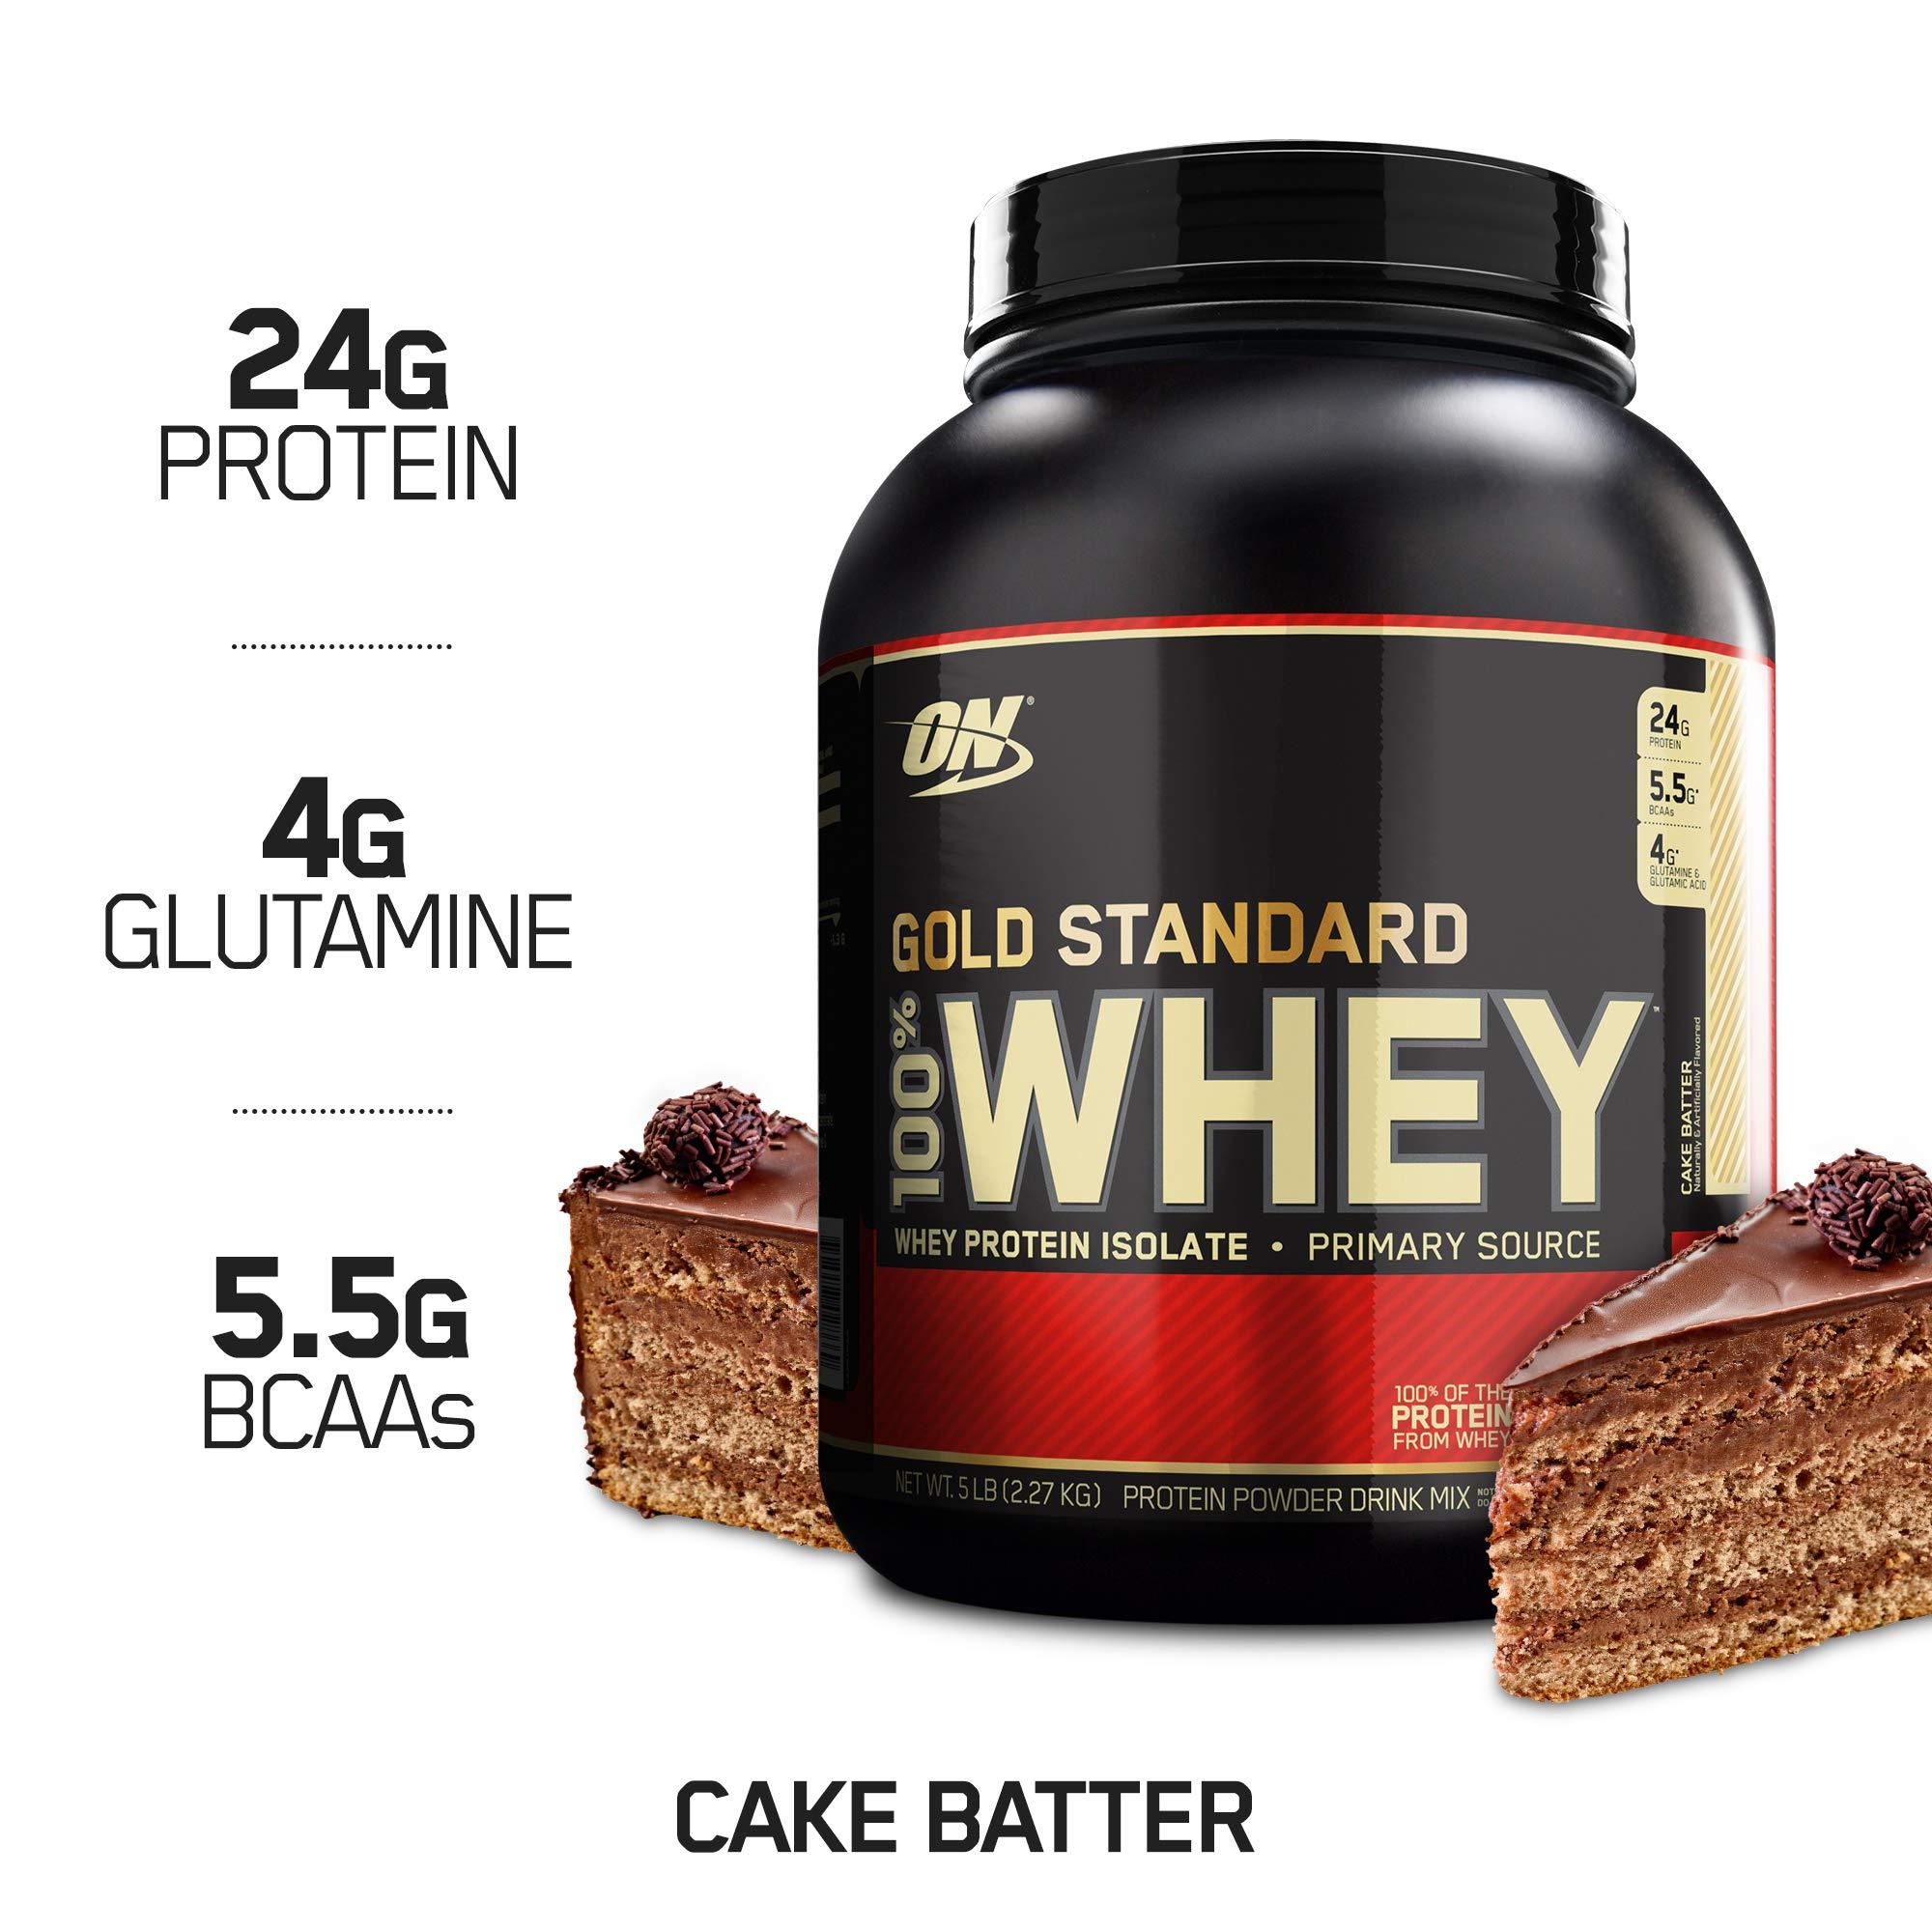 Optimum Nutrition Gold Standard 100% Whey Protein Powder, Cake Batter, 5 Pound by Optimum Nutrition